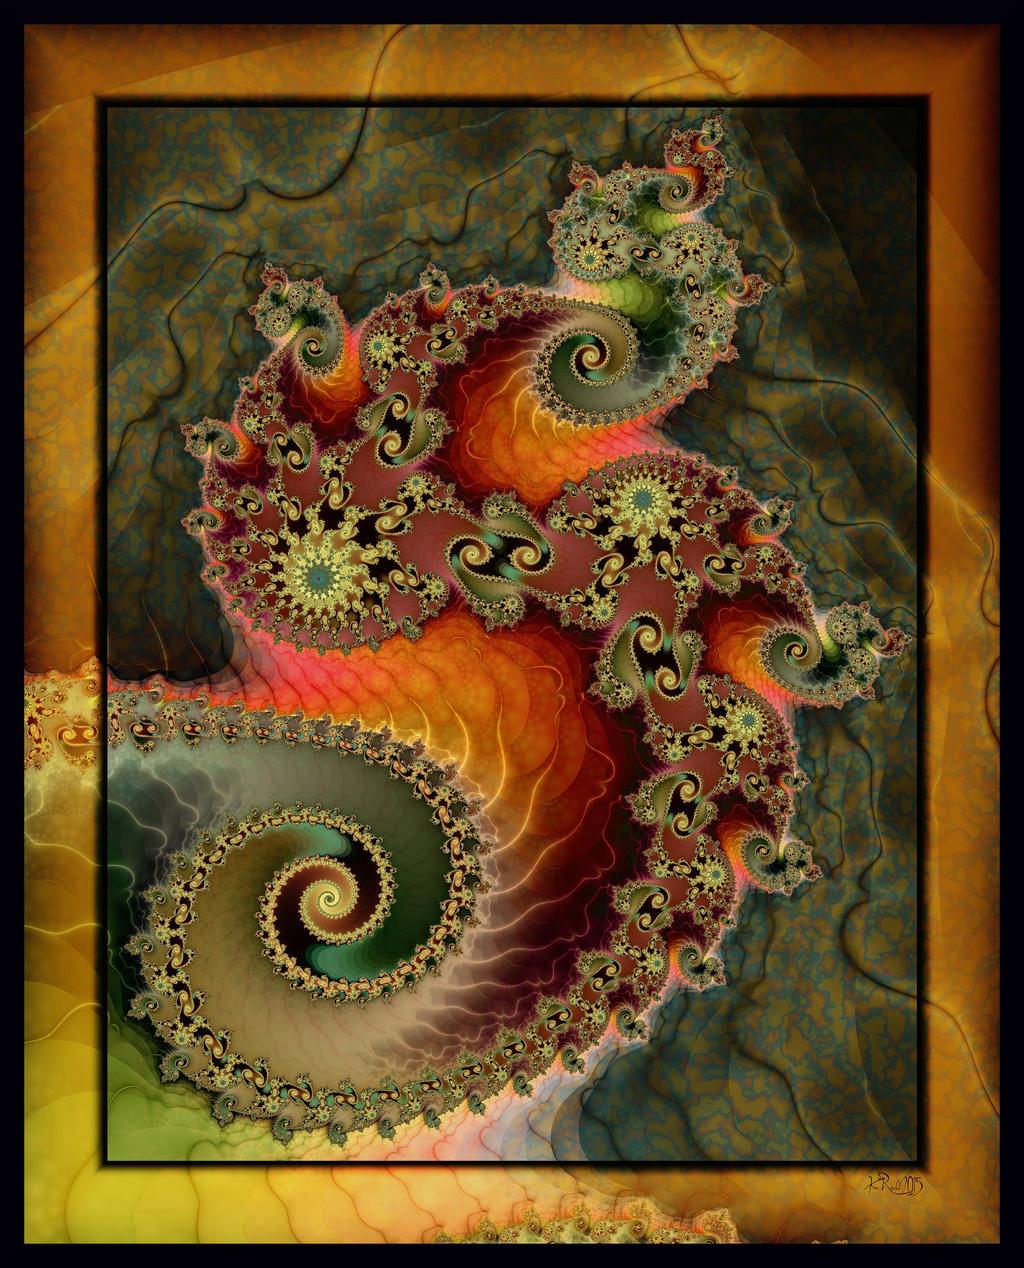 Unleashed Dragon by beautifulchaos1